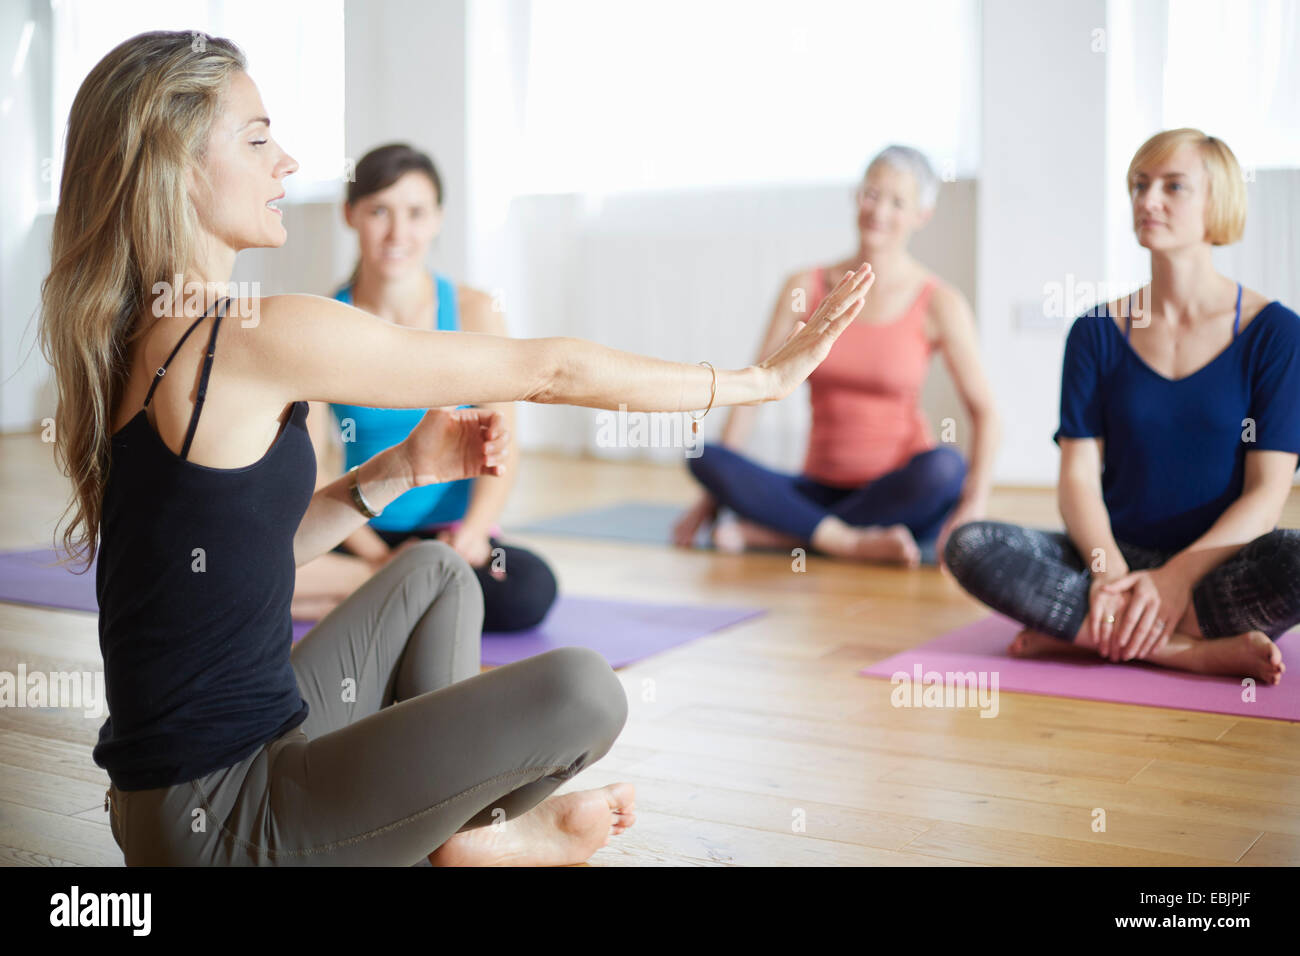 Tutor de hembras maduras con los brazos extendidos en clase de pilates Imagen De Stock